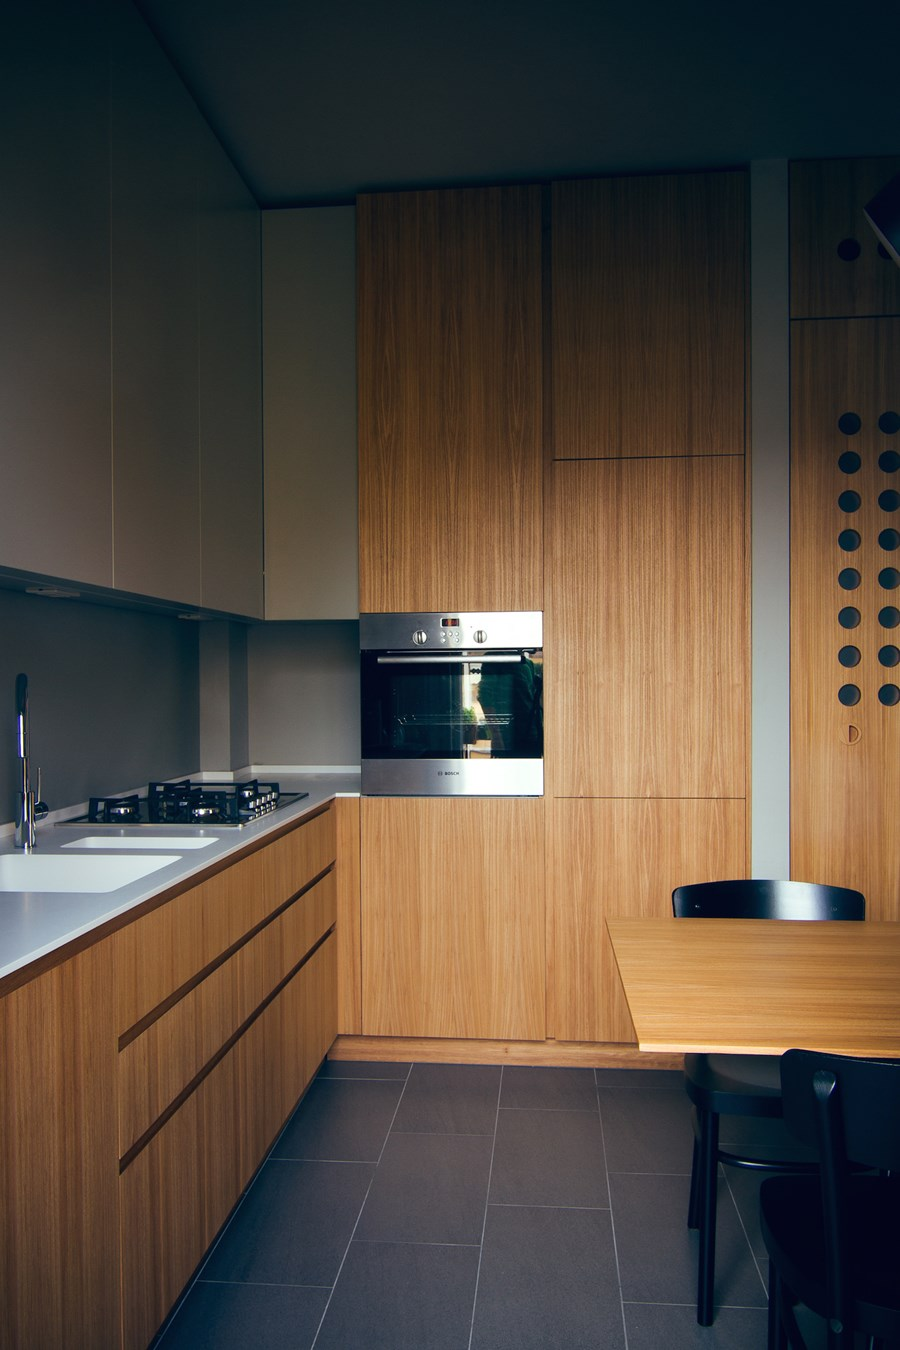 House#02 by Andrea Rubini architect 02